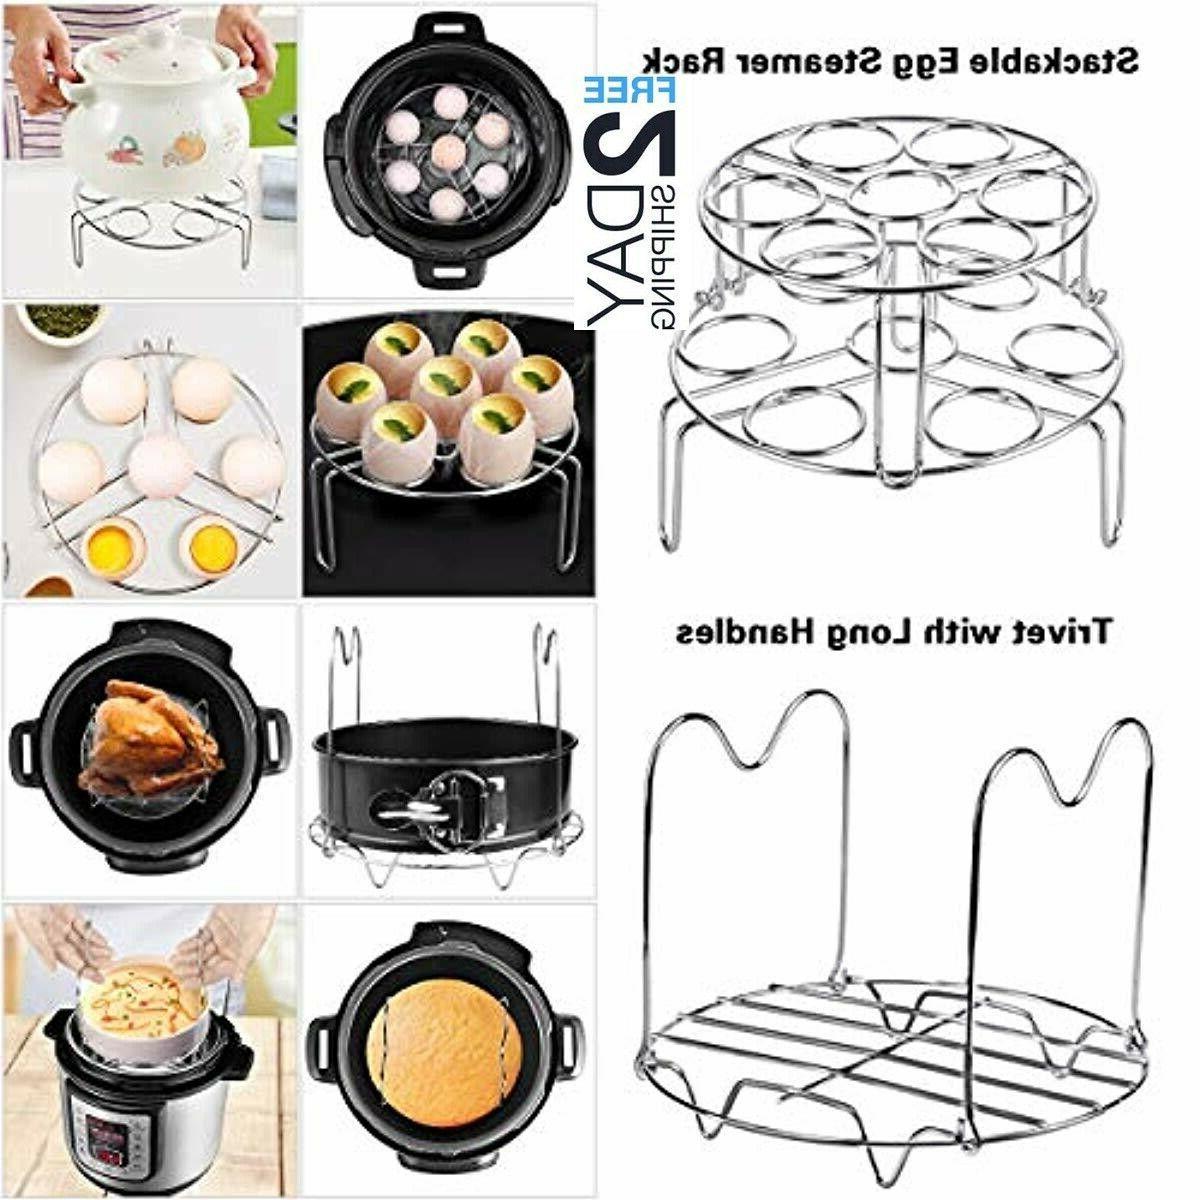 18 Cooker Accessories Instant Pot -